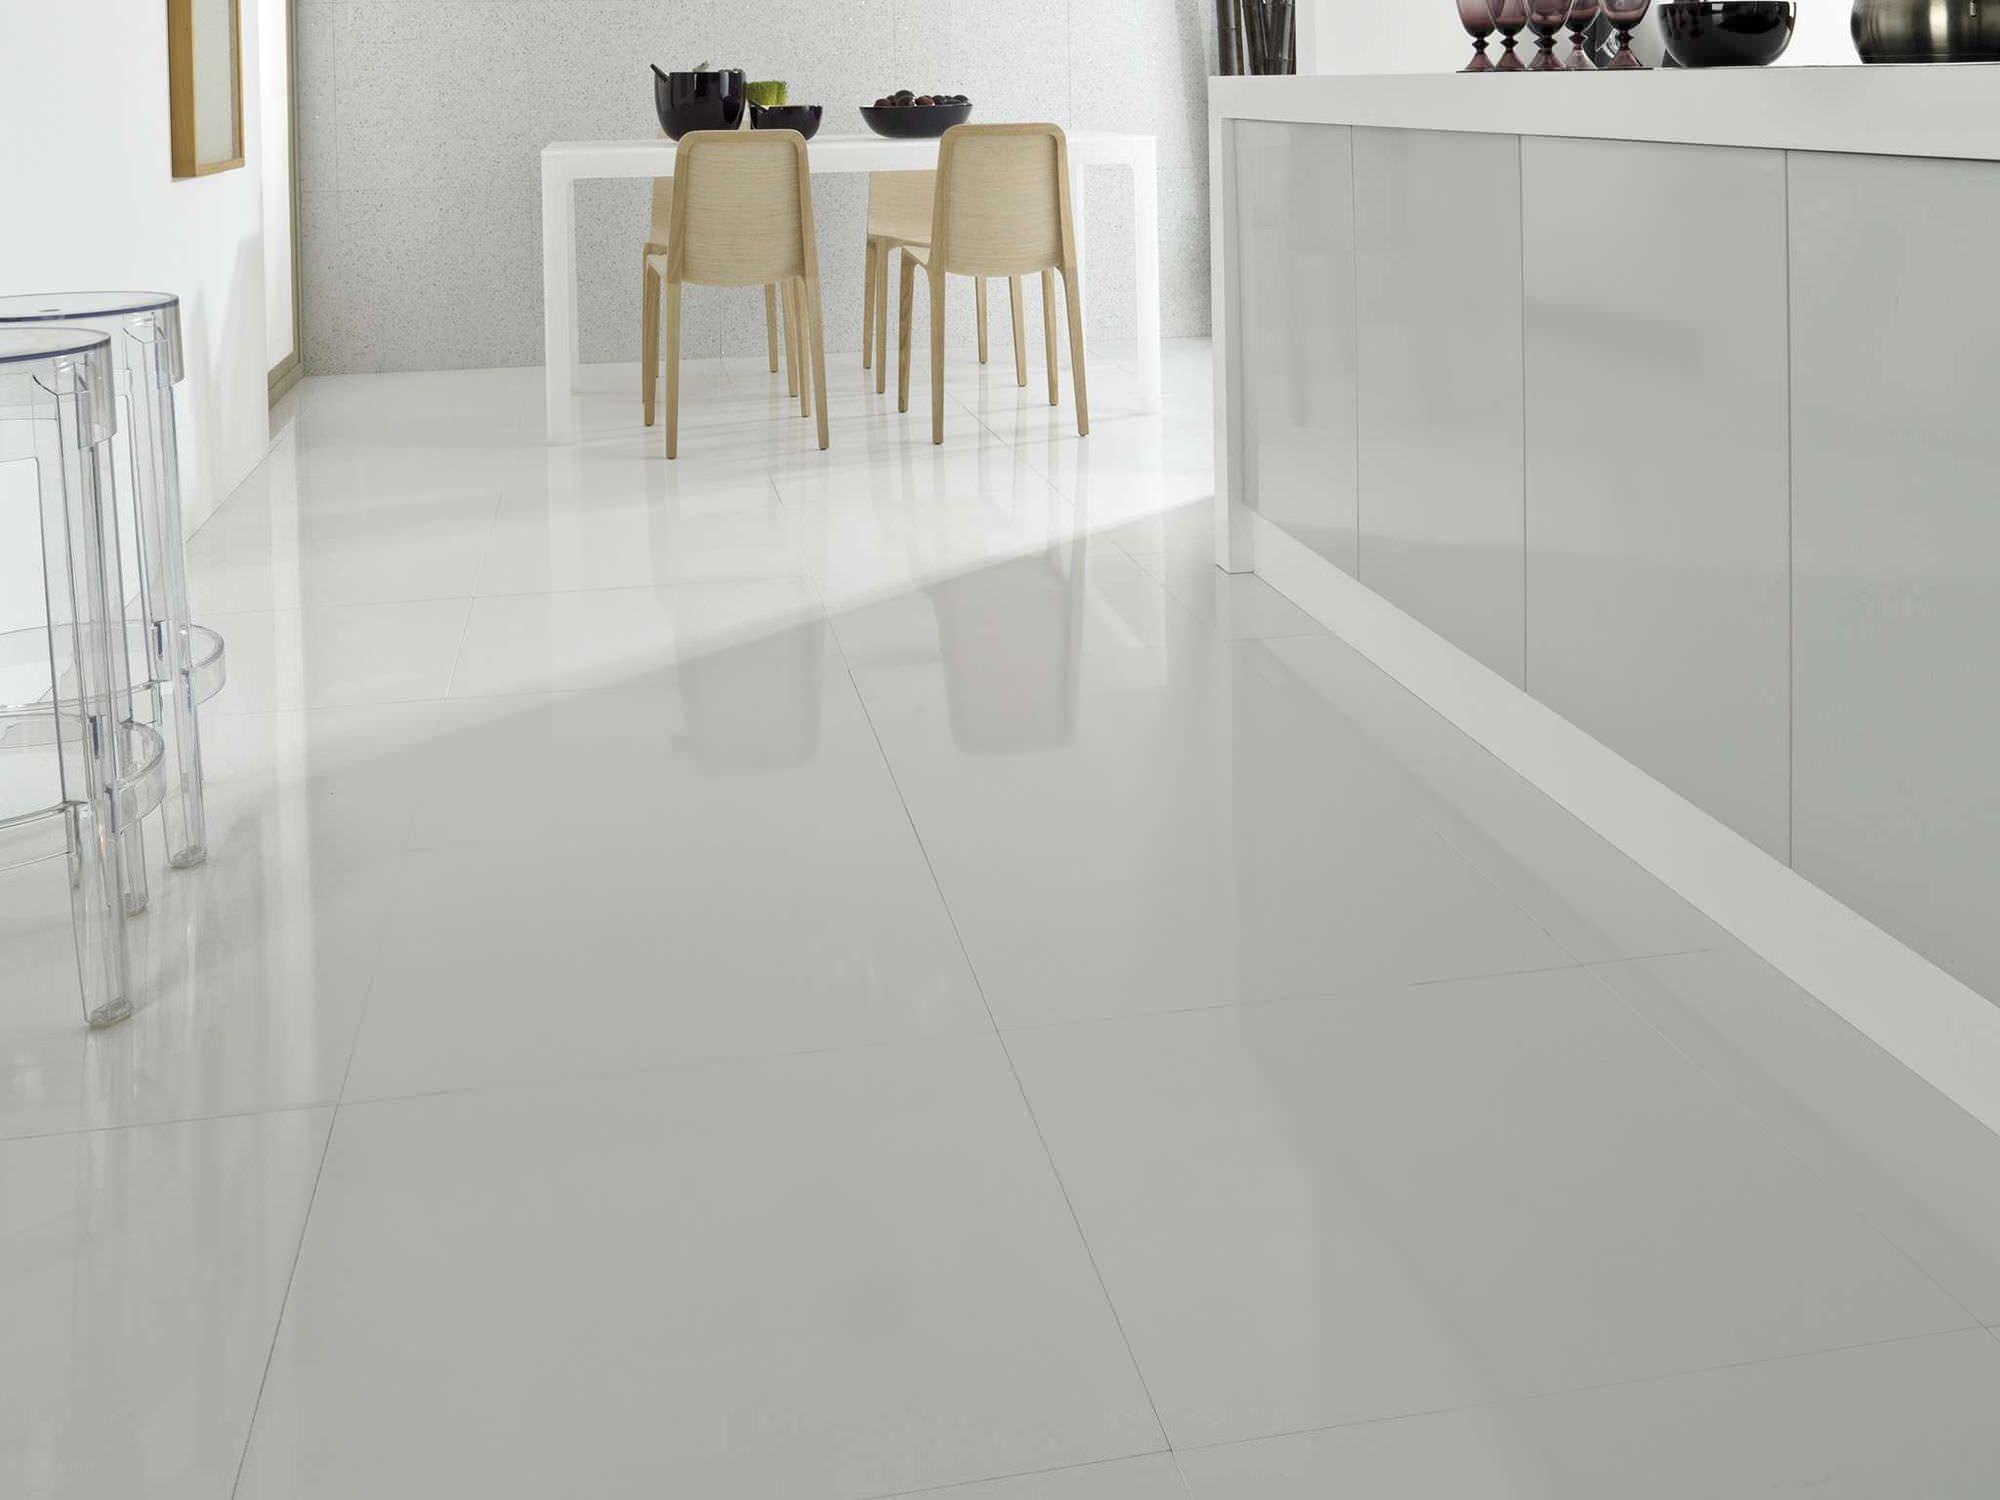 Floor tile / engineered stone / matte - DQS (DESIGN QUARTZ STONE ...